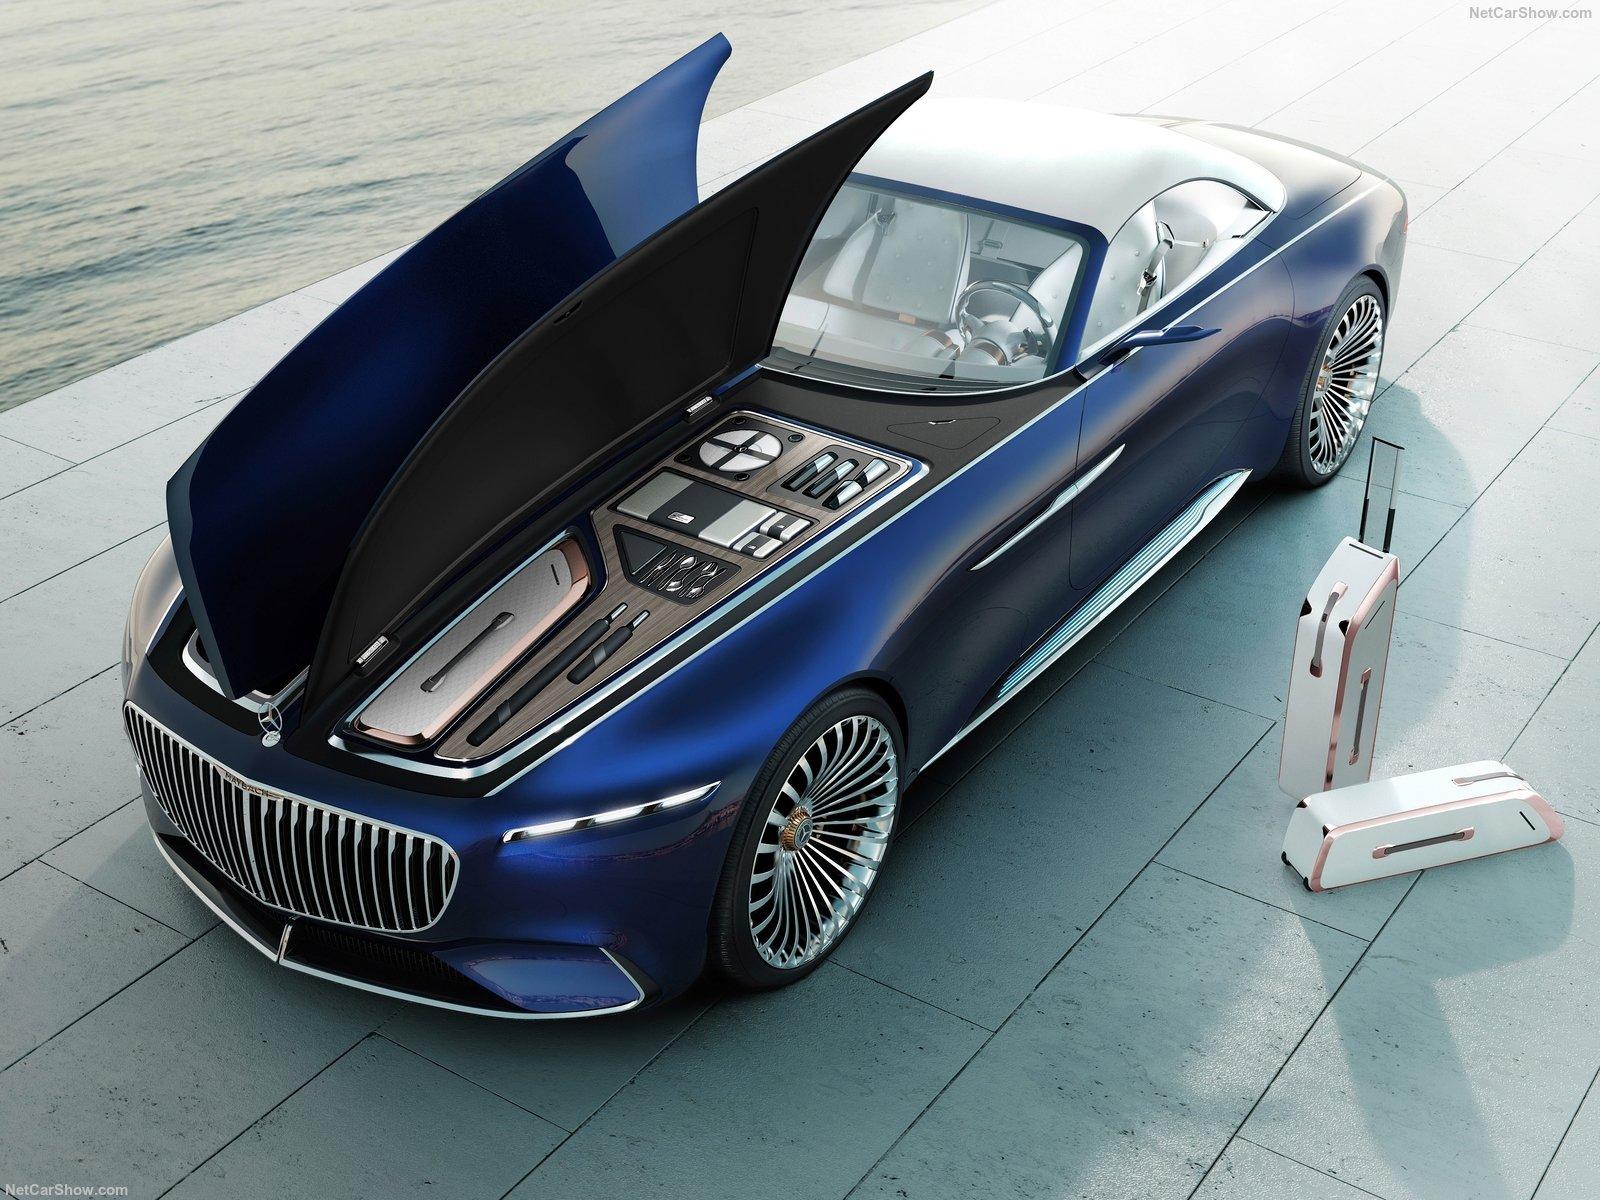 7_mercedes-benz-vision_maybach_6_cabriolet_concept-2017-1600-05.jpg